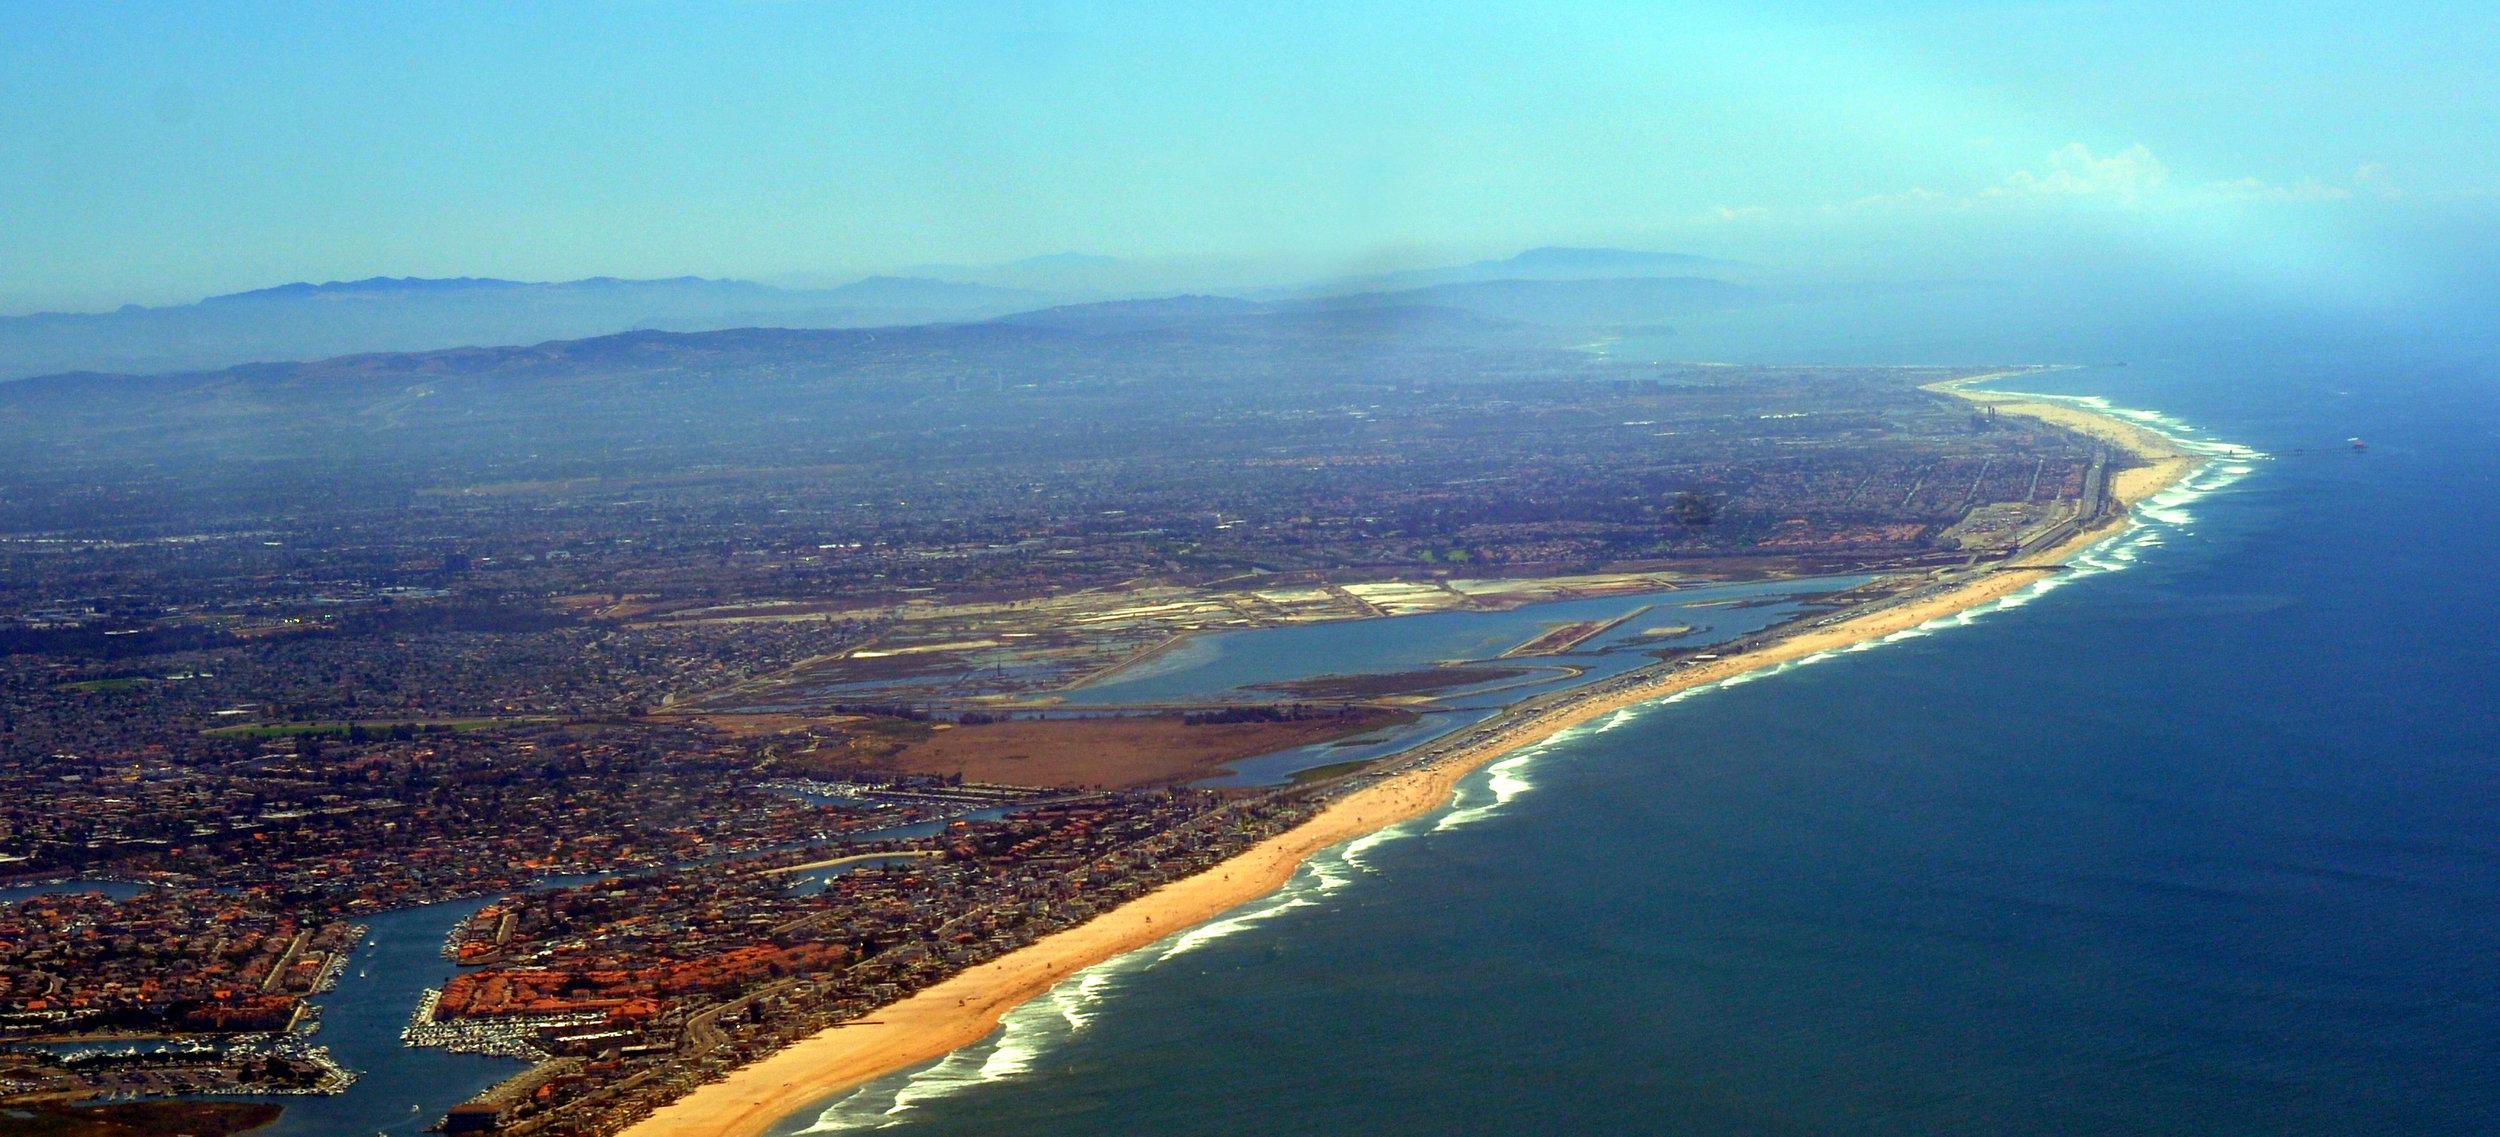 Bolsa Chica Wetlands, Huntington Beach, Orange Co. CA.  Photo by D. Ramey Logan